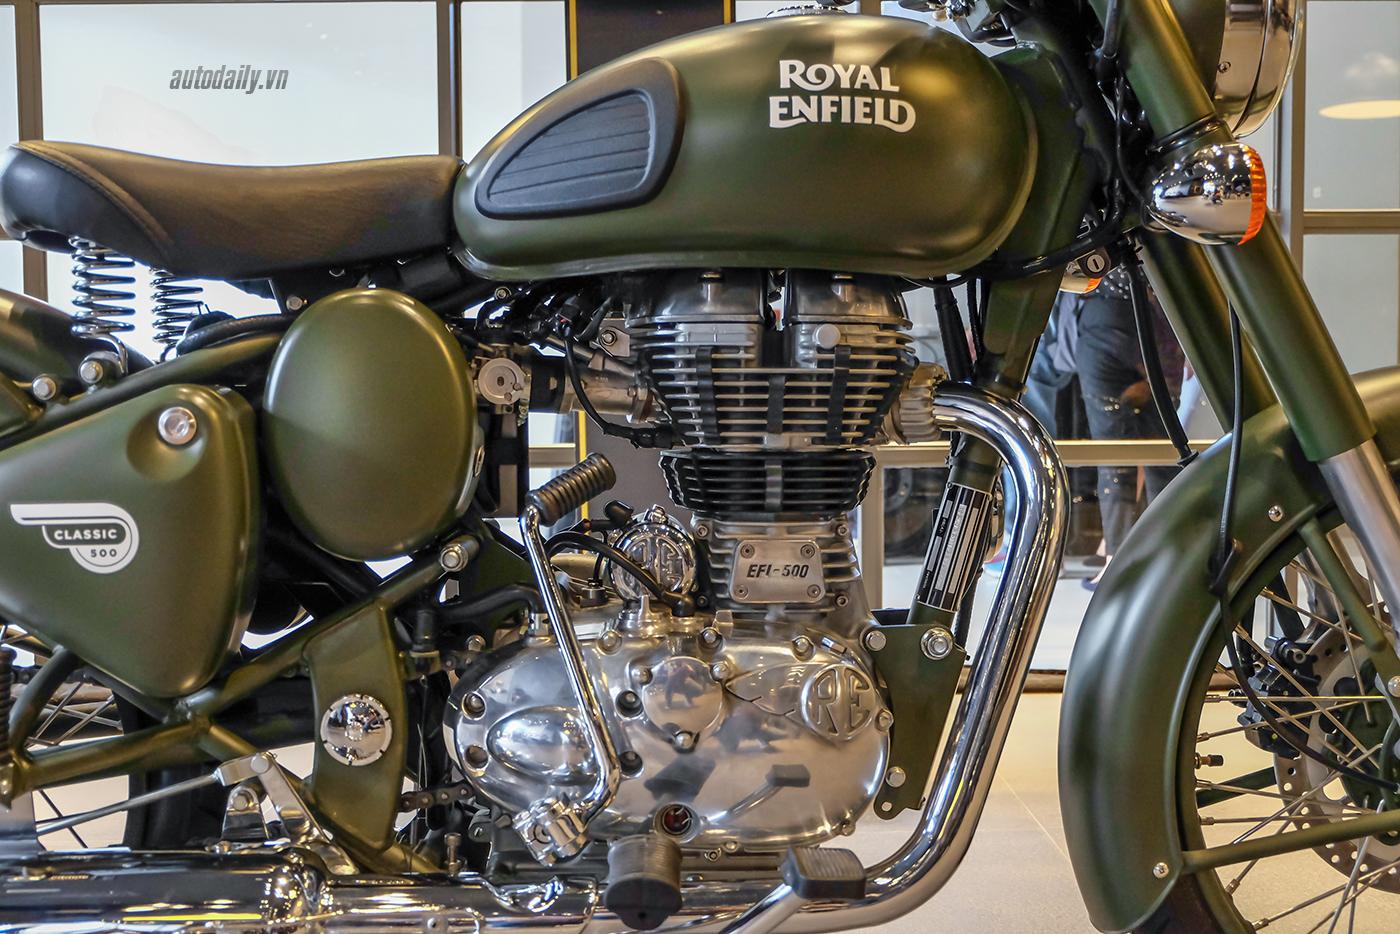 royal-enfield-classic-500-8.jpg